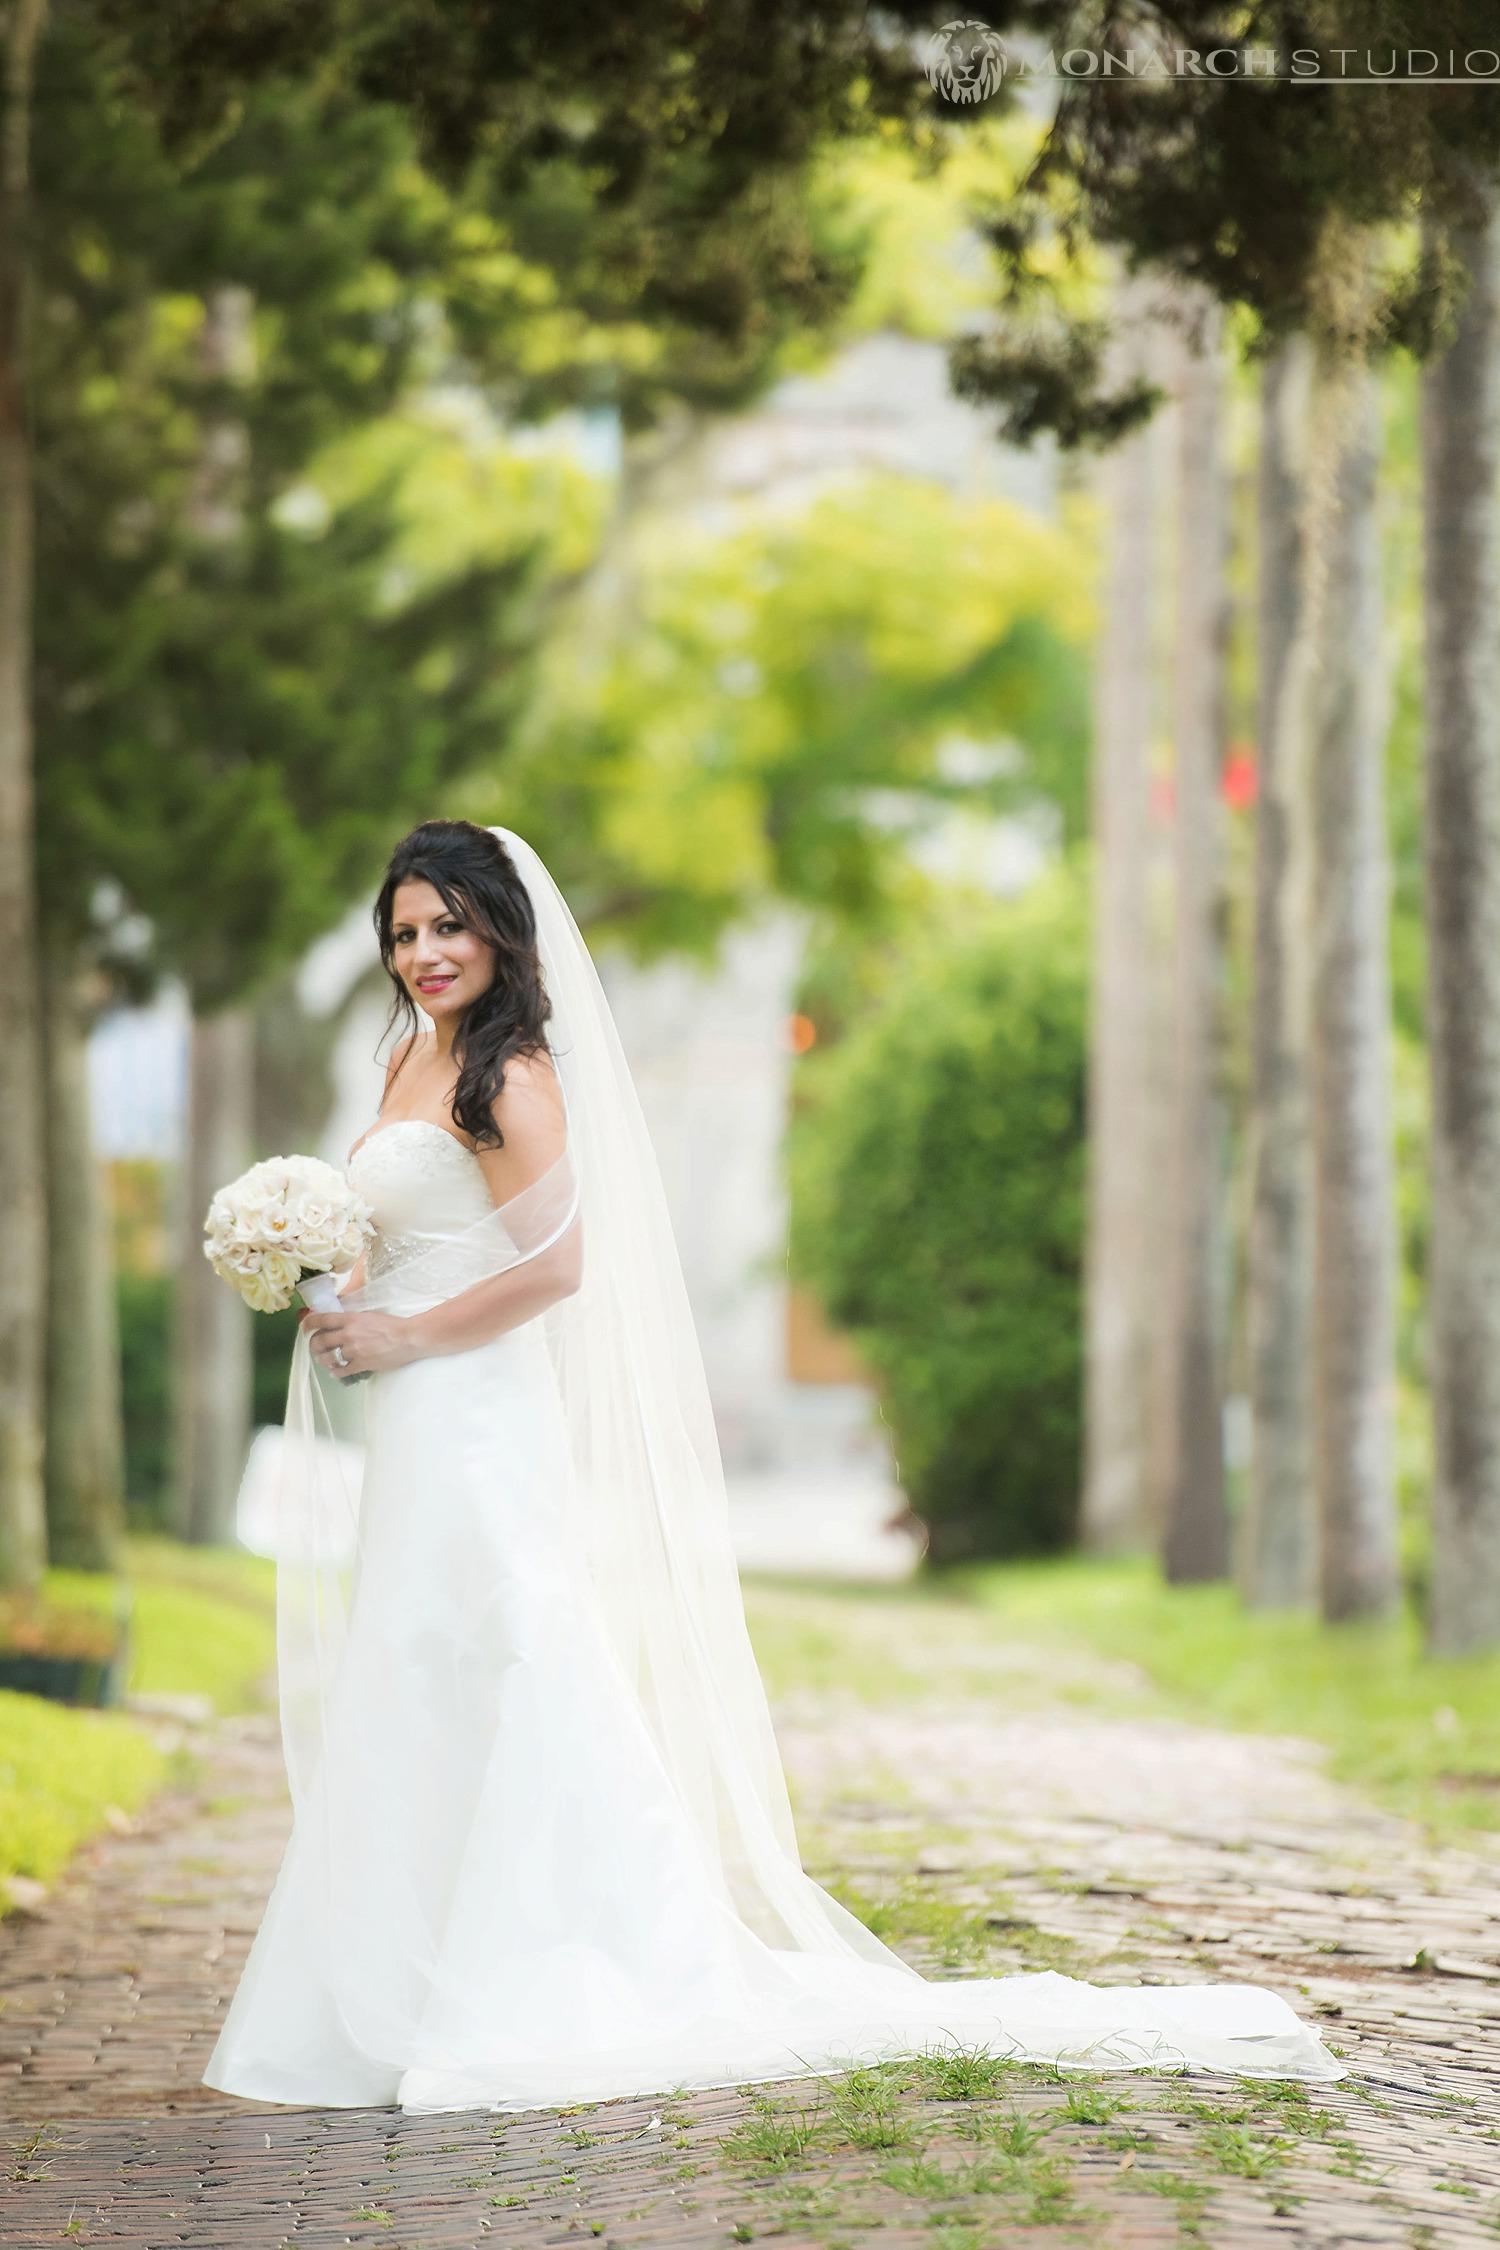 Spanish-Speaking-Wedding-Photographer-St-Augustine-Florida_0044.jpg